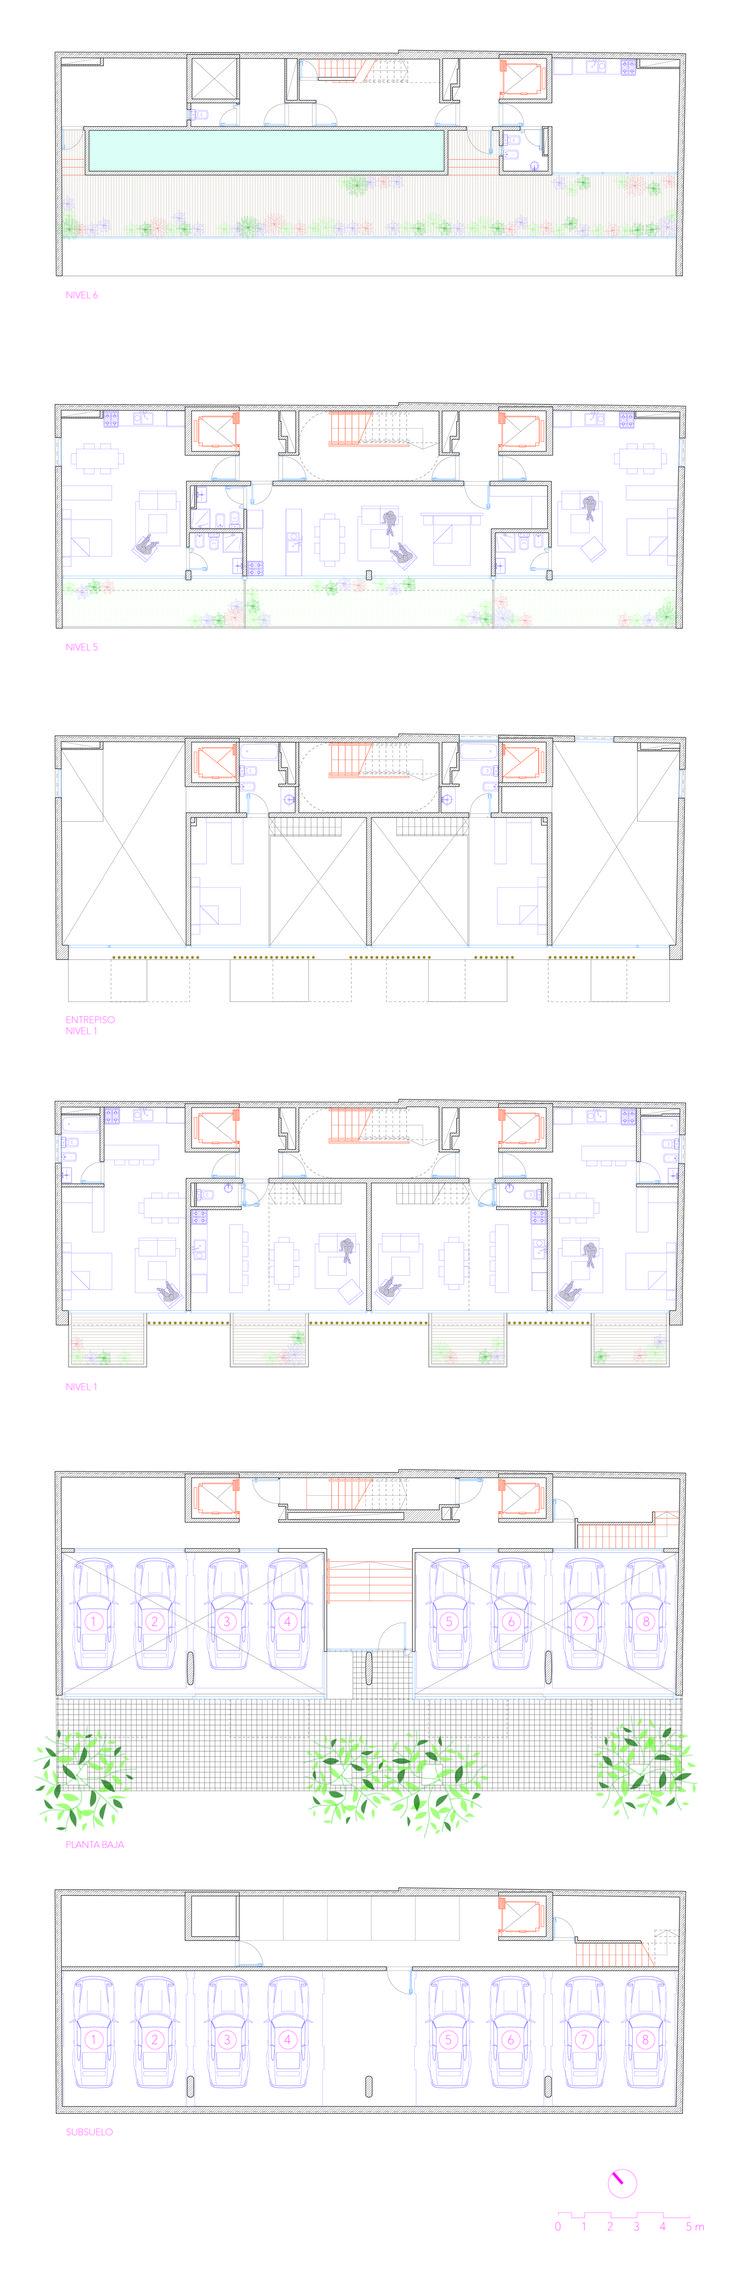 Galer 237 a de casa patio ar arquitetos 22 - Gallery Of Ancon Building Irene Joselevich Ana Rascovsky Billy Gutraich 13